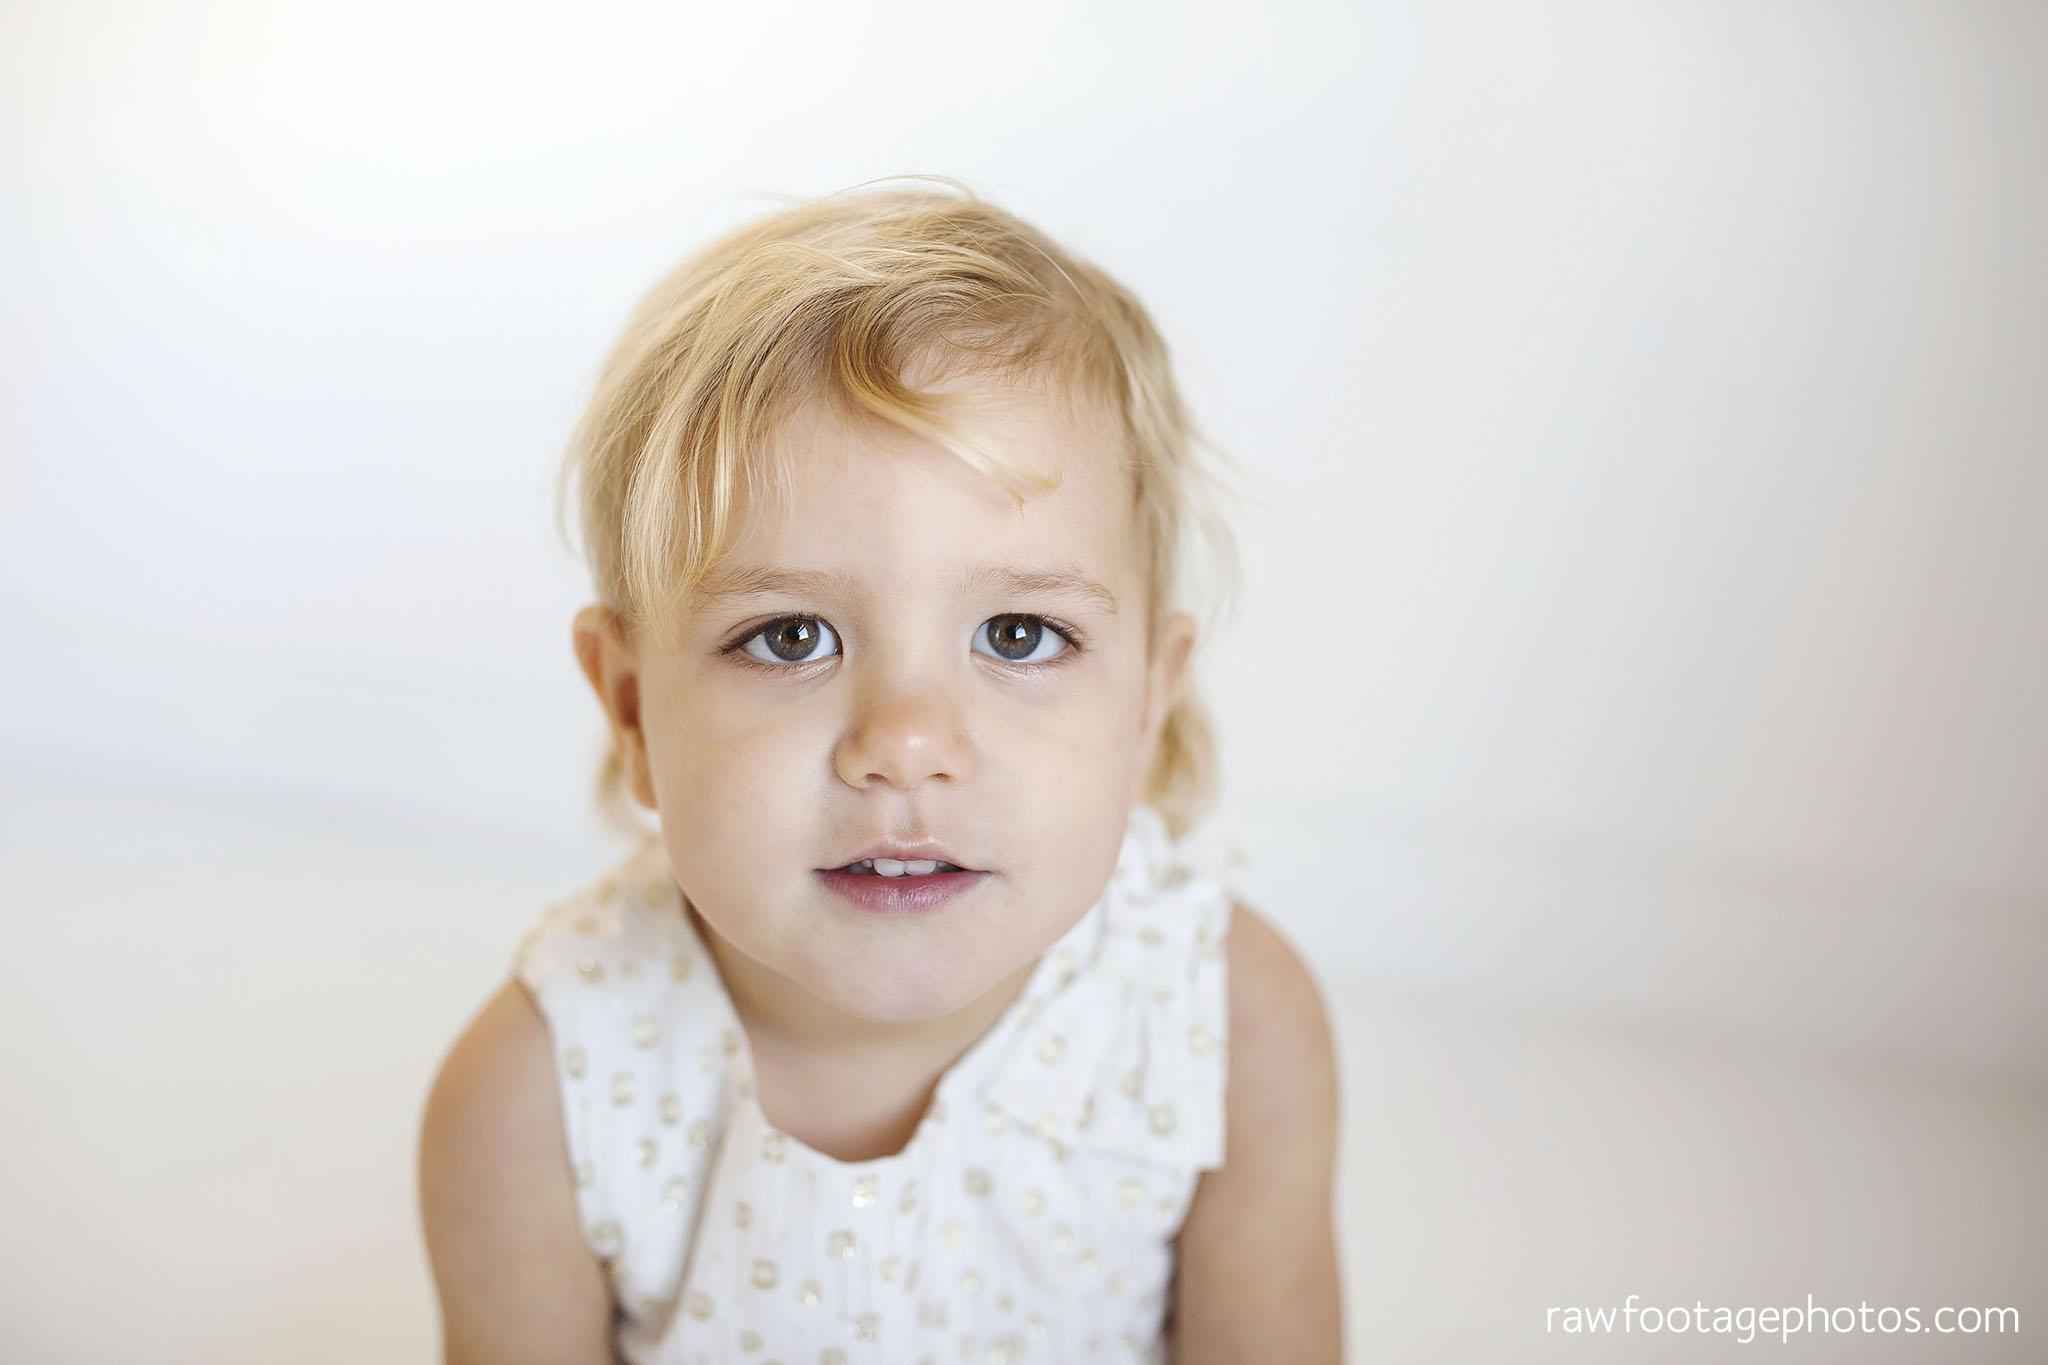 london_ontario_family_photographer-studio_photography-studio_lifestyle_portraits-white_studio-mother_son-candid_family_photography-raw_footage_photography033.jpg